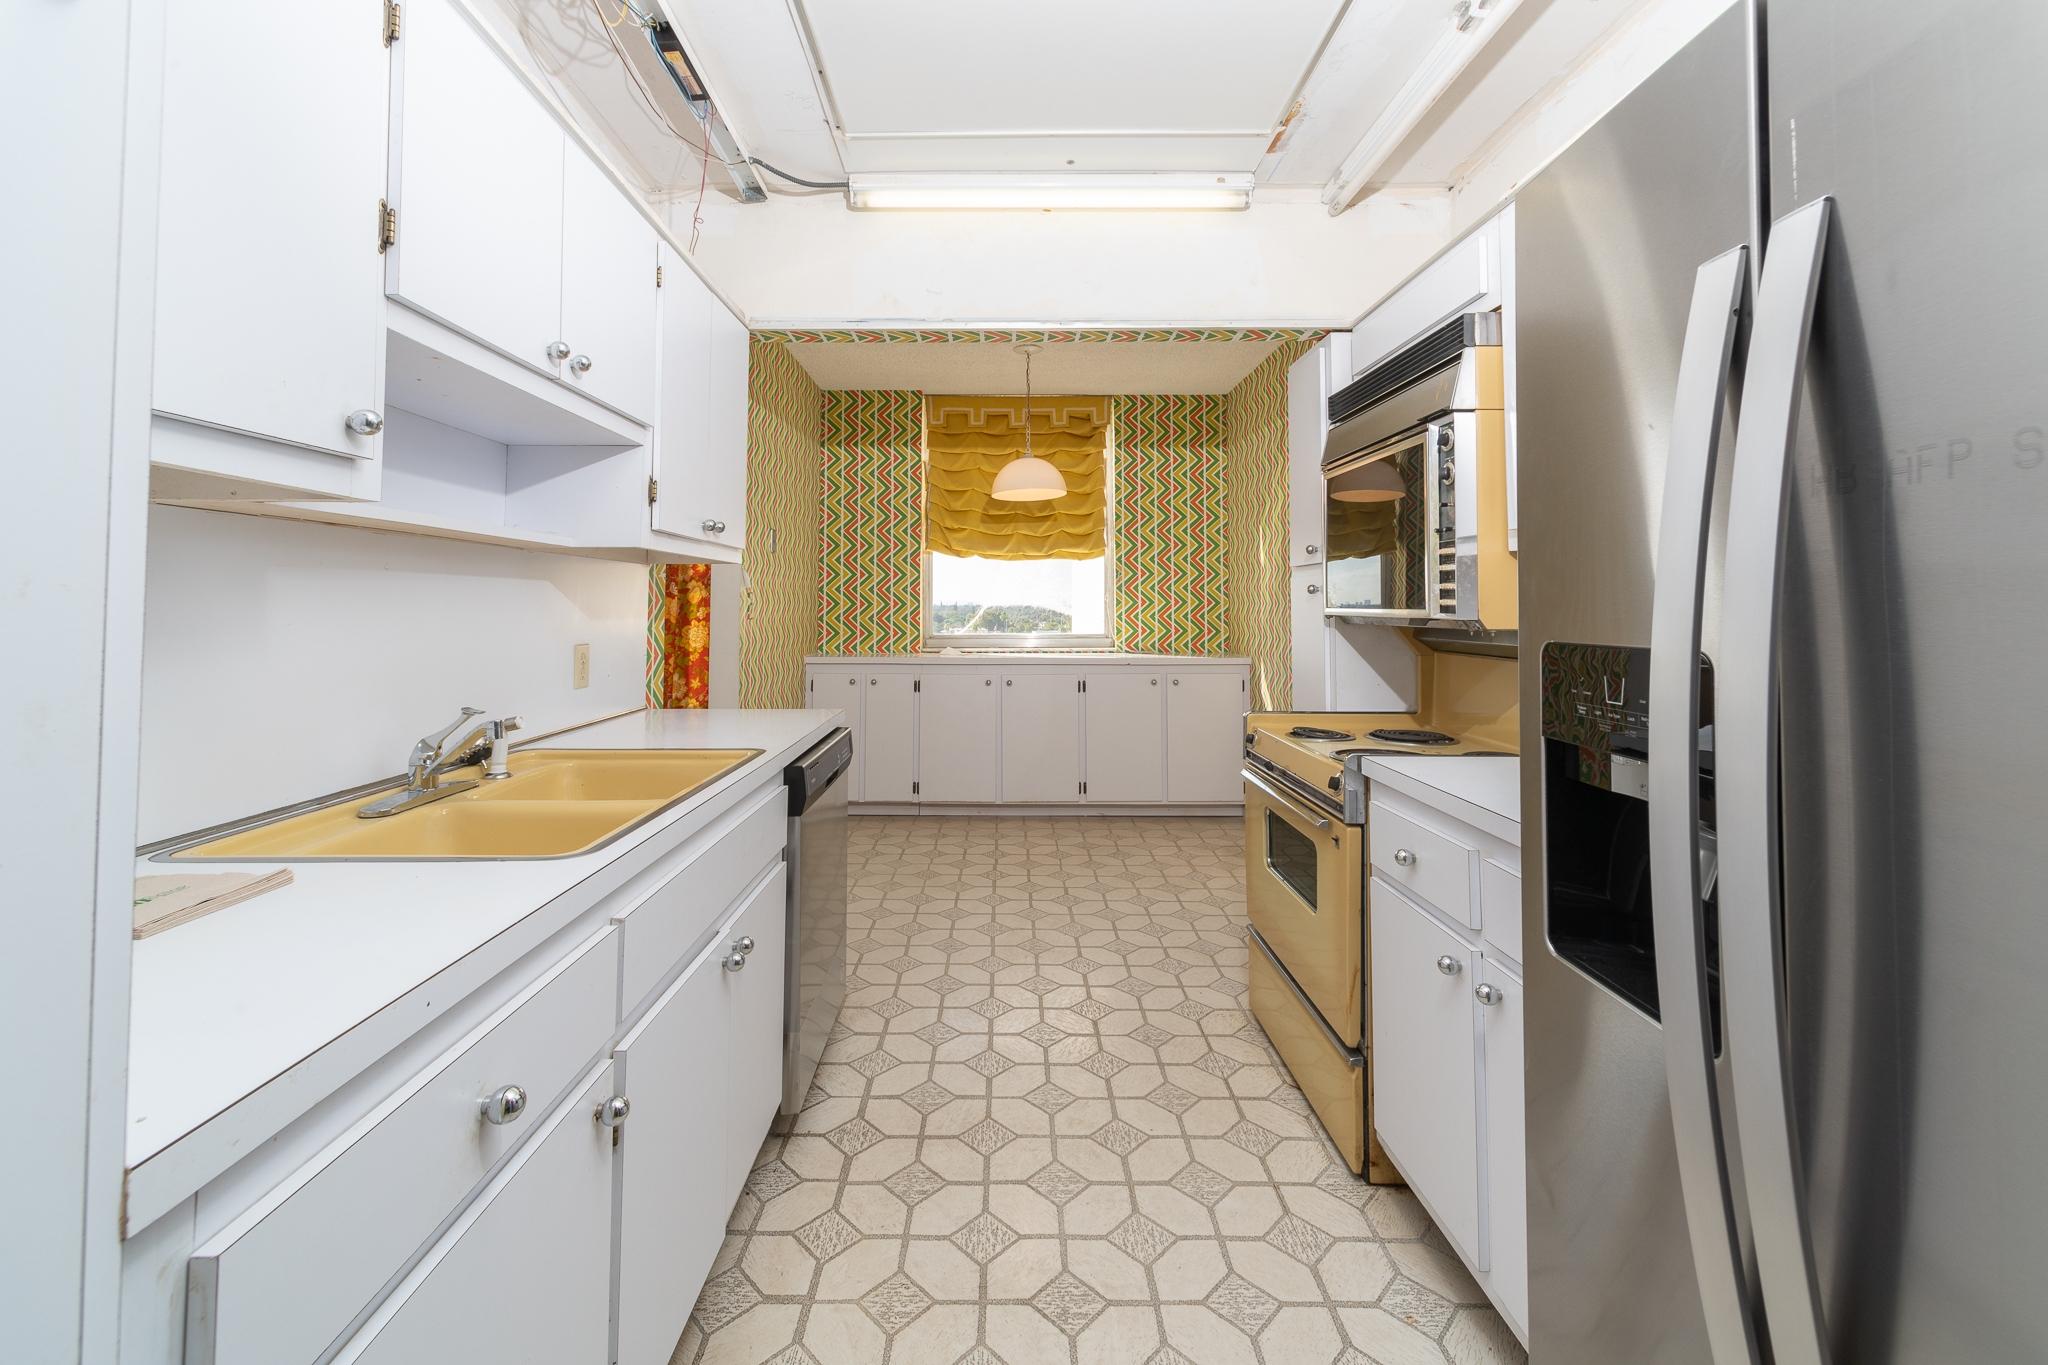 Upcoming Project Condominium Remodel Kitchen